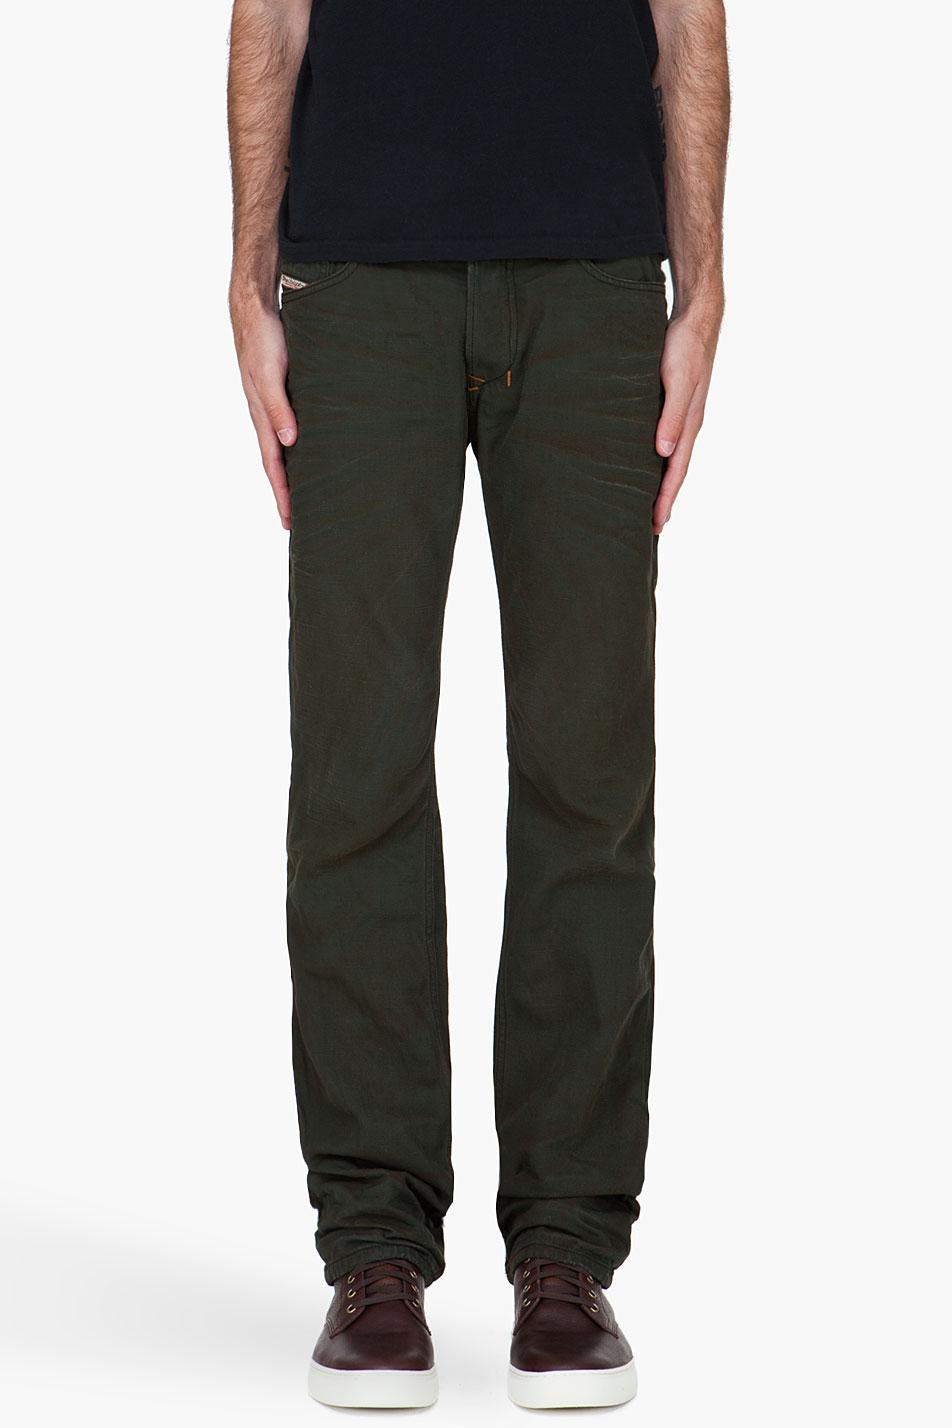 Diesel Dark Green Safado Jeans in Blue for Men   Lyst